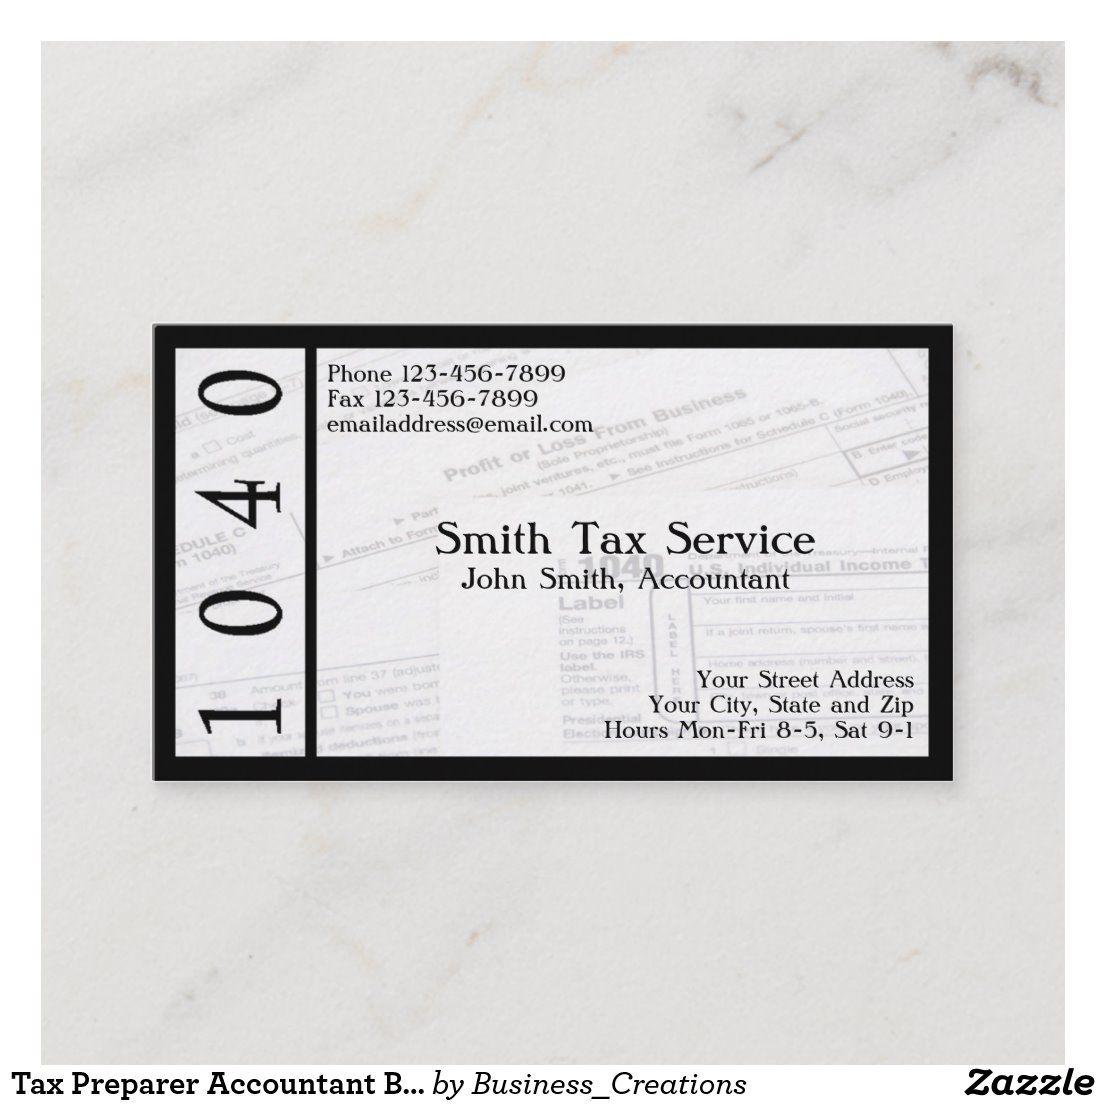 Tax Preparer Accountant Business Card Zazzle Com Tax Preparation Custom Business Cards Accounting